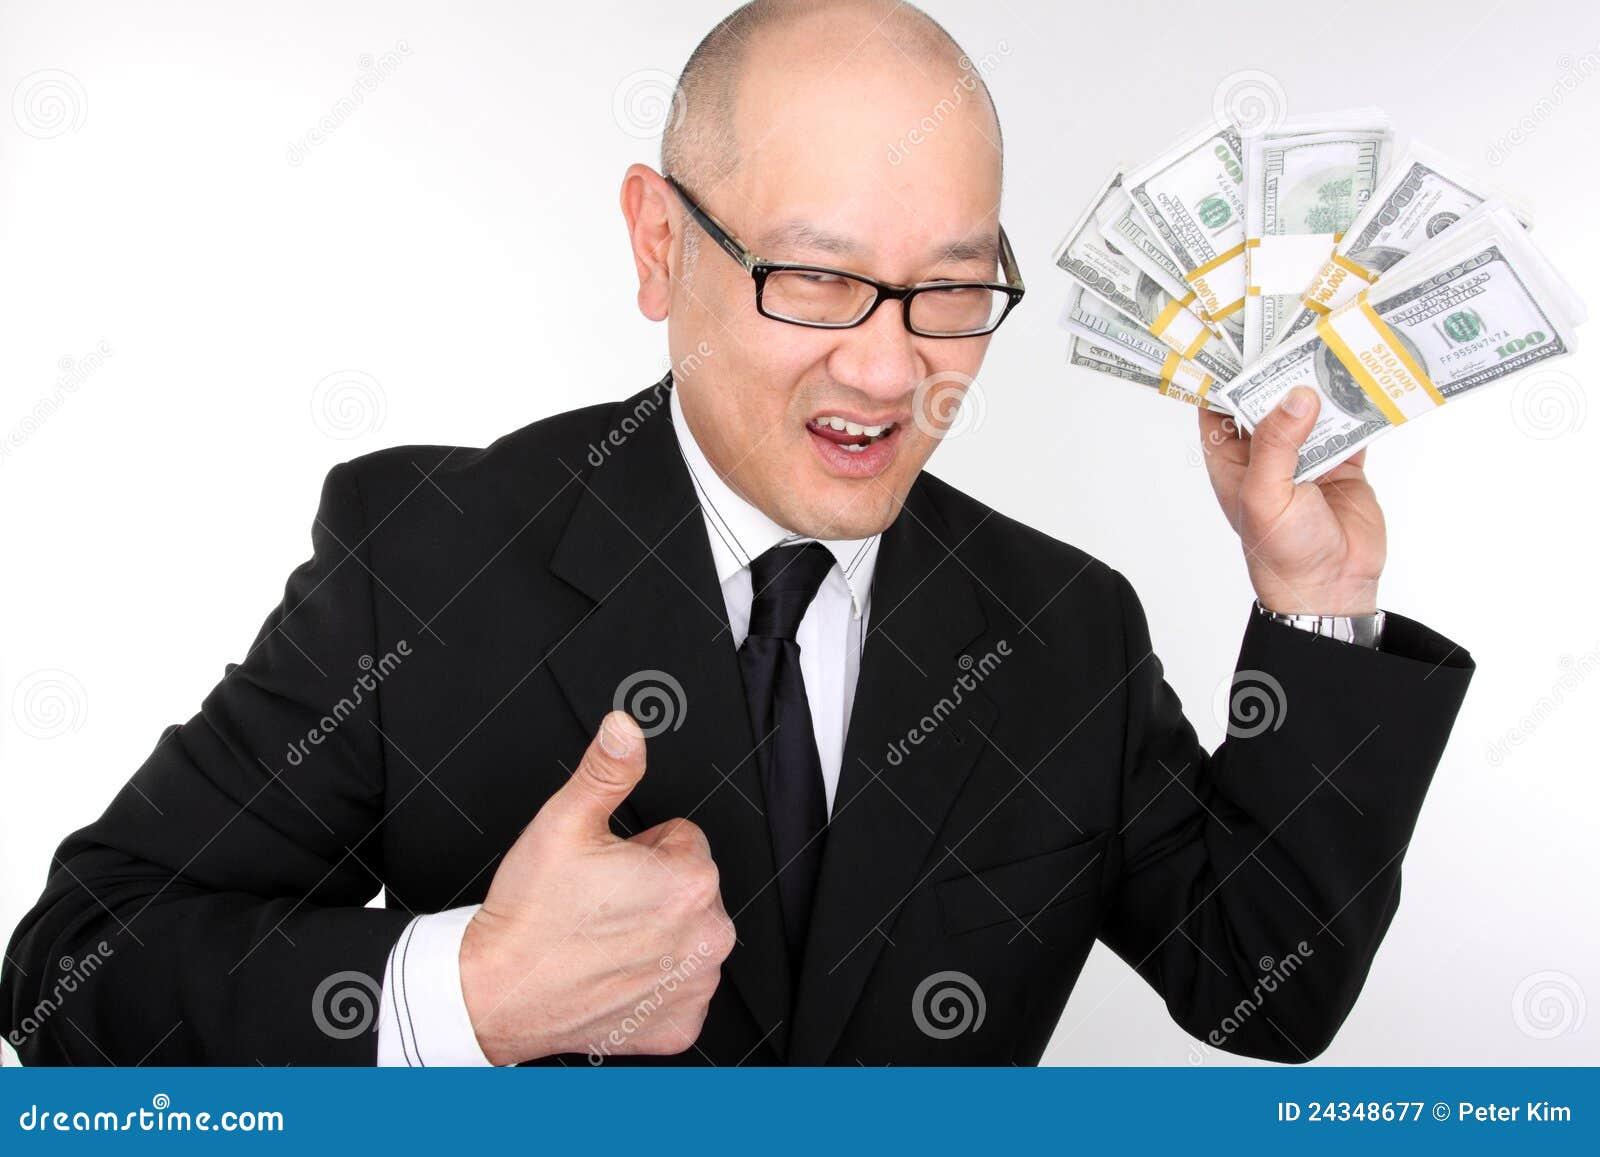 Greedy executive